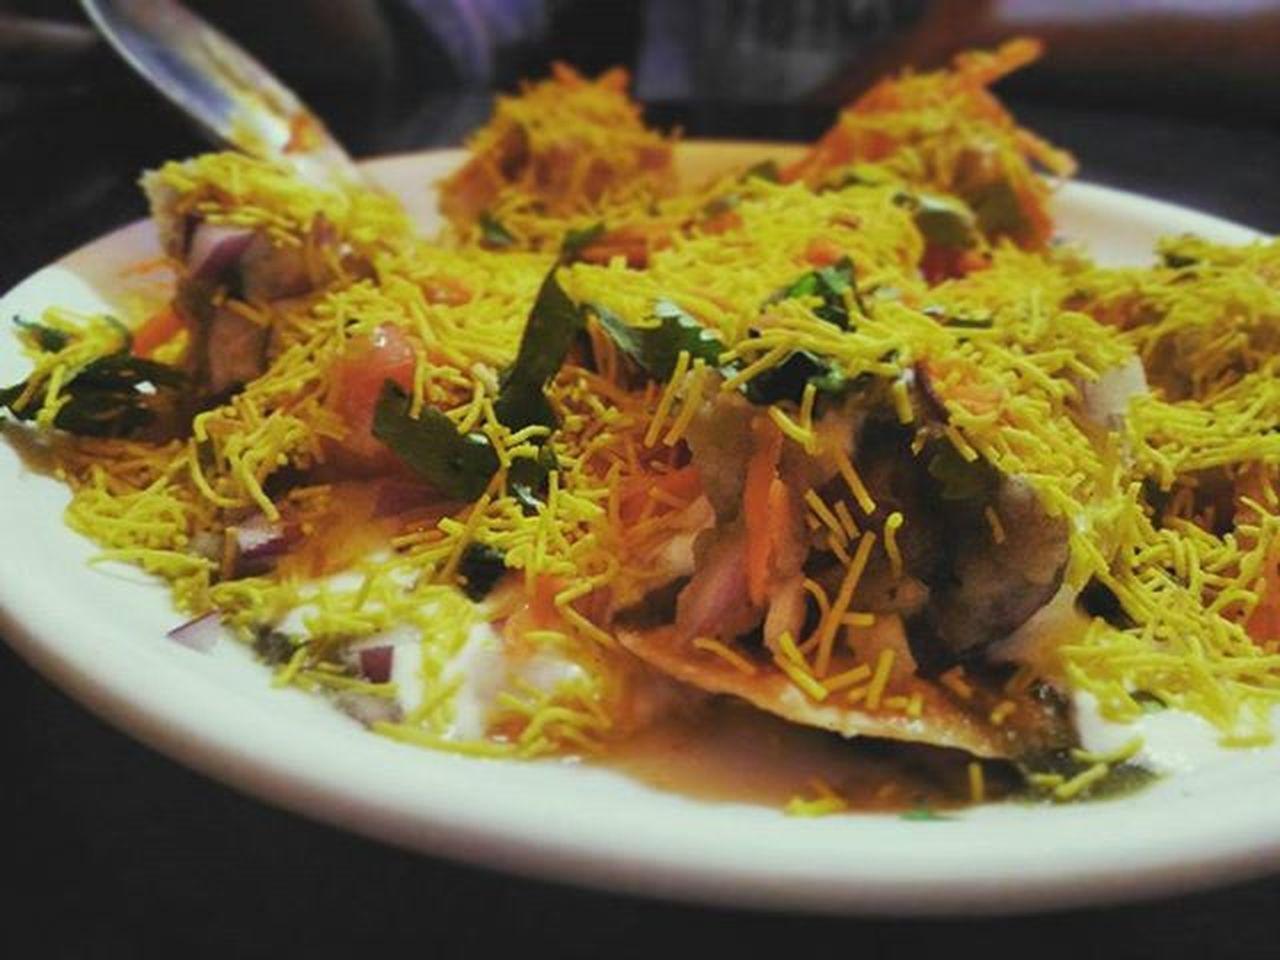 Sevpuri Foodie Picoftheday Namma_bengaluru Tasty Instabengaluru Foodphotography Everydaybanglore Streetfood Peace Bengalurudairies Bestevening  Nammakarnataka Smallhappiness Enjoyeverymoment